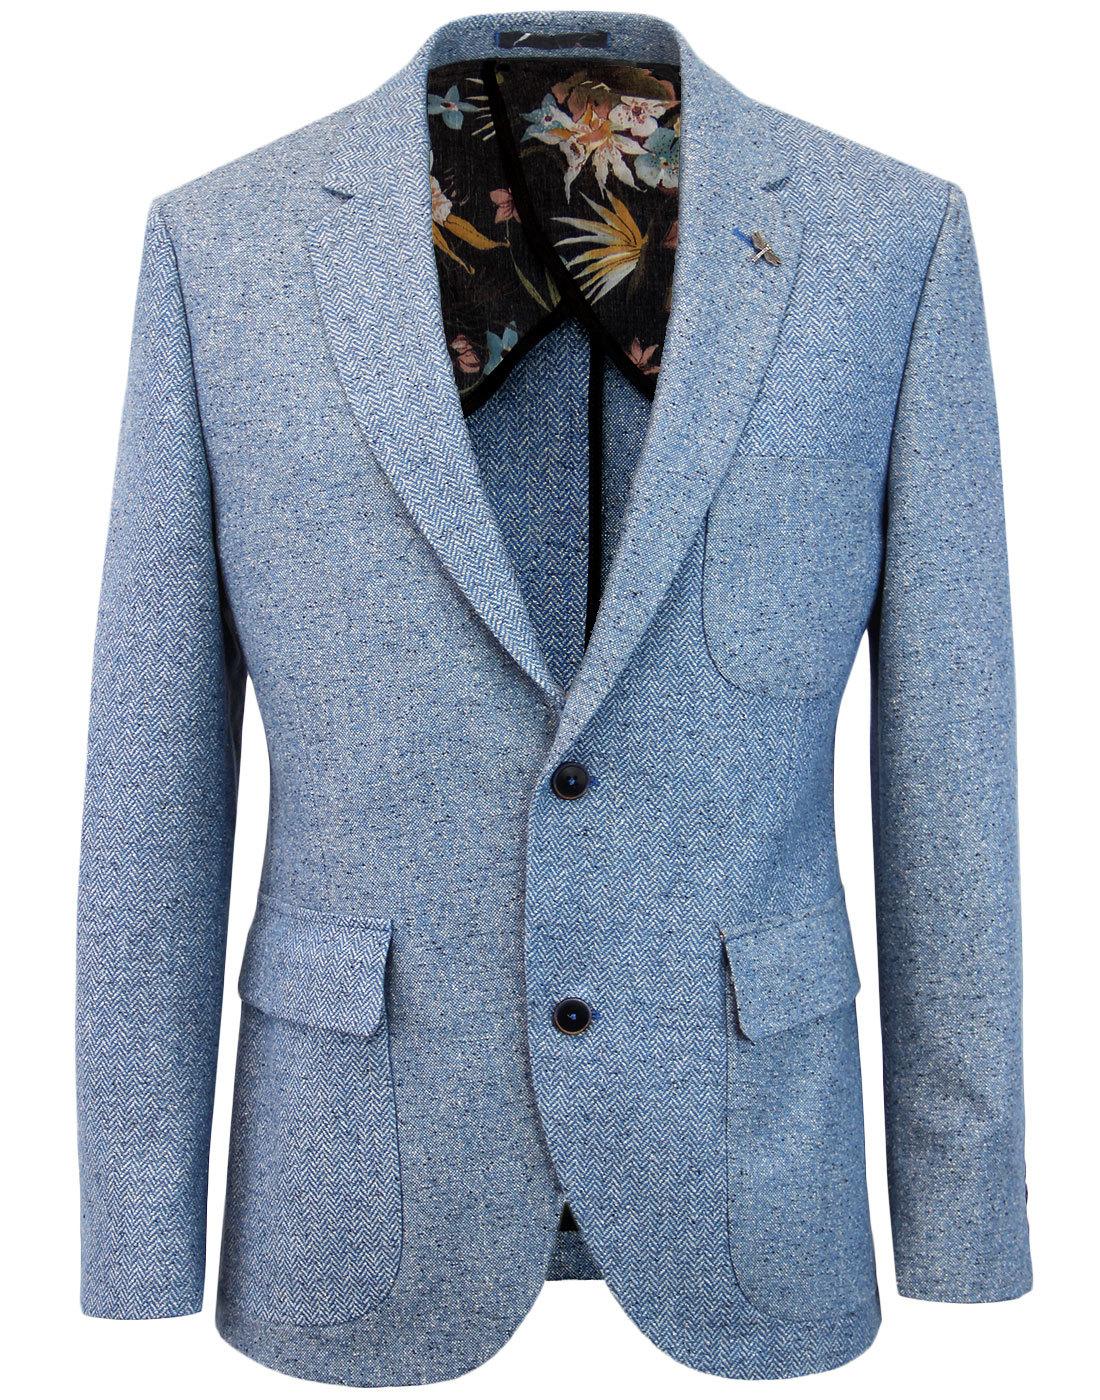 GIBSON LONDON Mod Herringbone Donegal Blazer BLUE